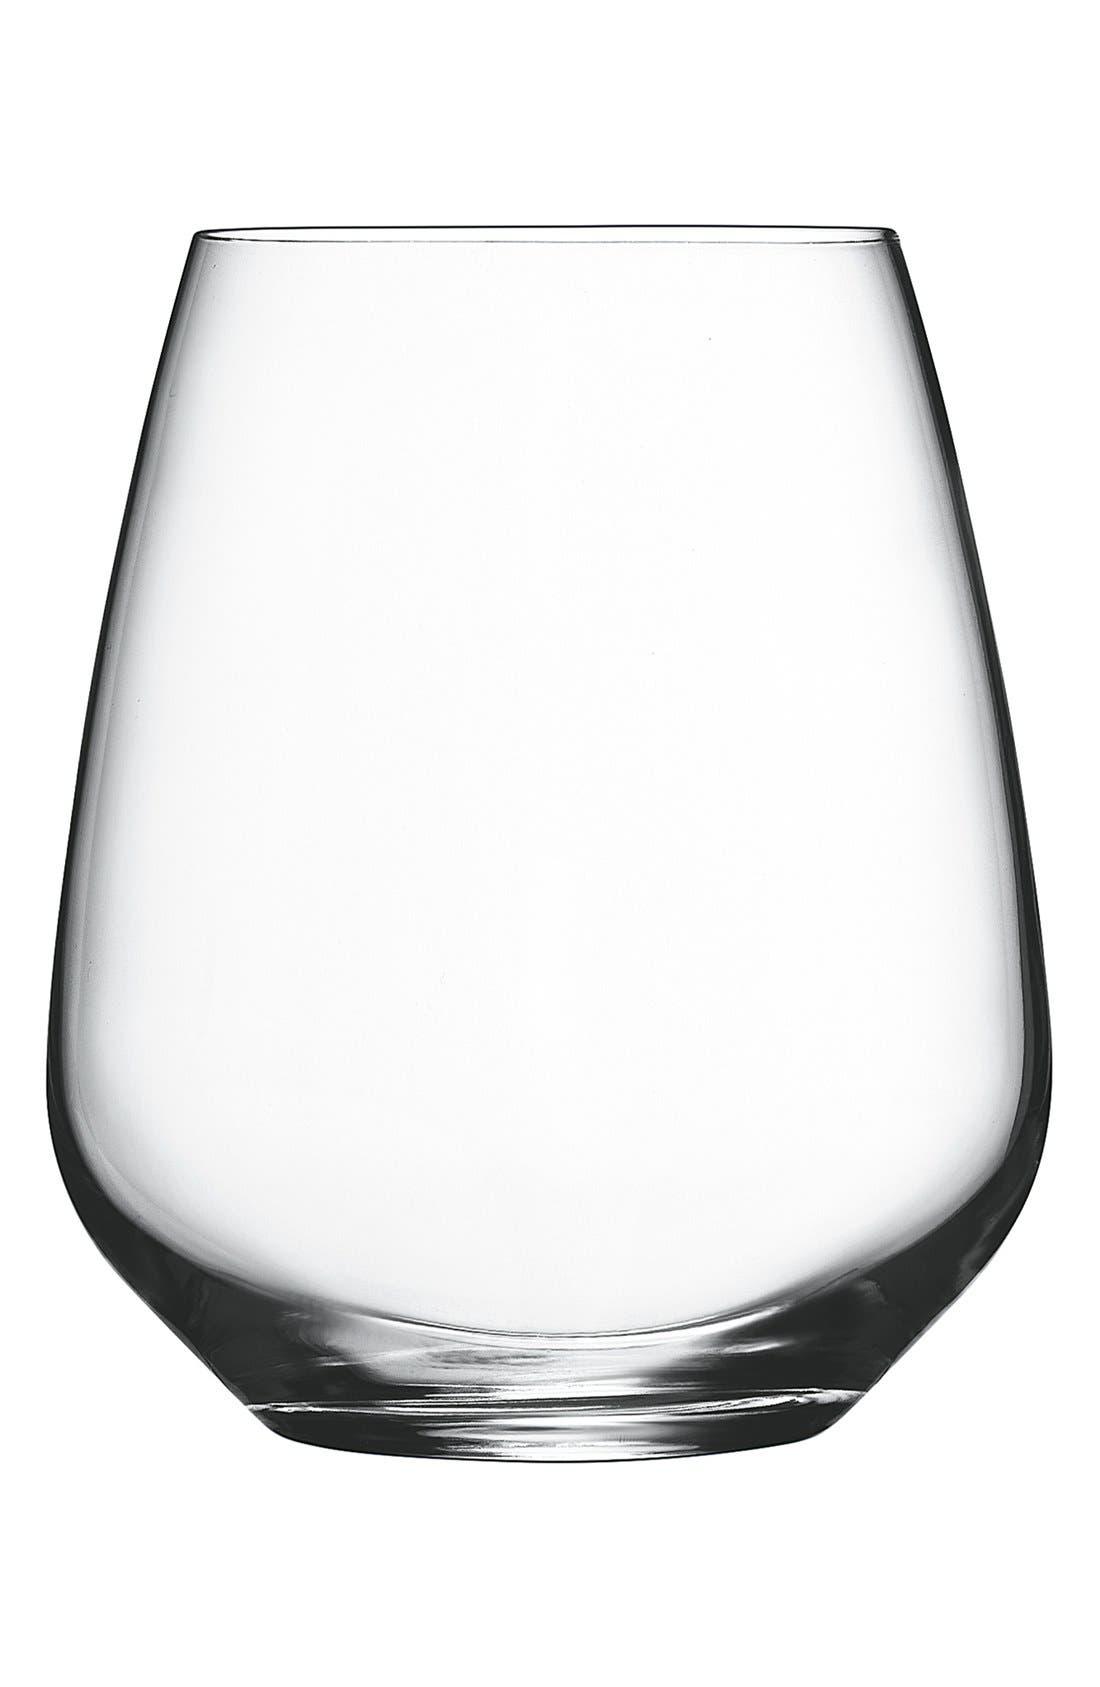 Luigi Bormioli 'Crescendo' Stemless Wine Glasses (Set of 4)